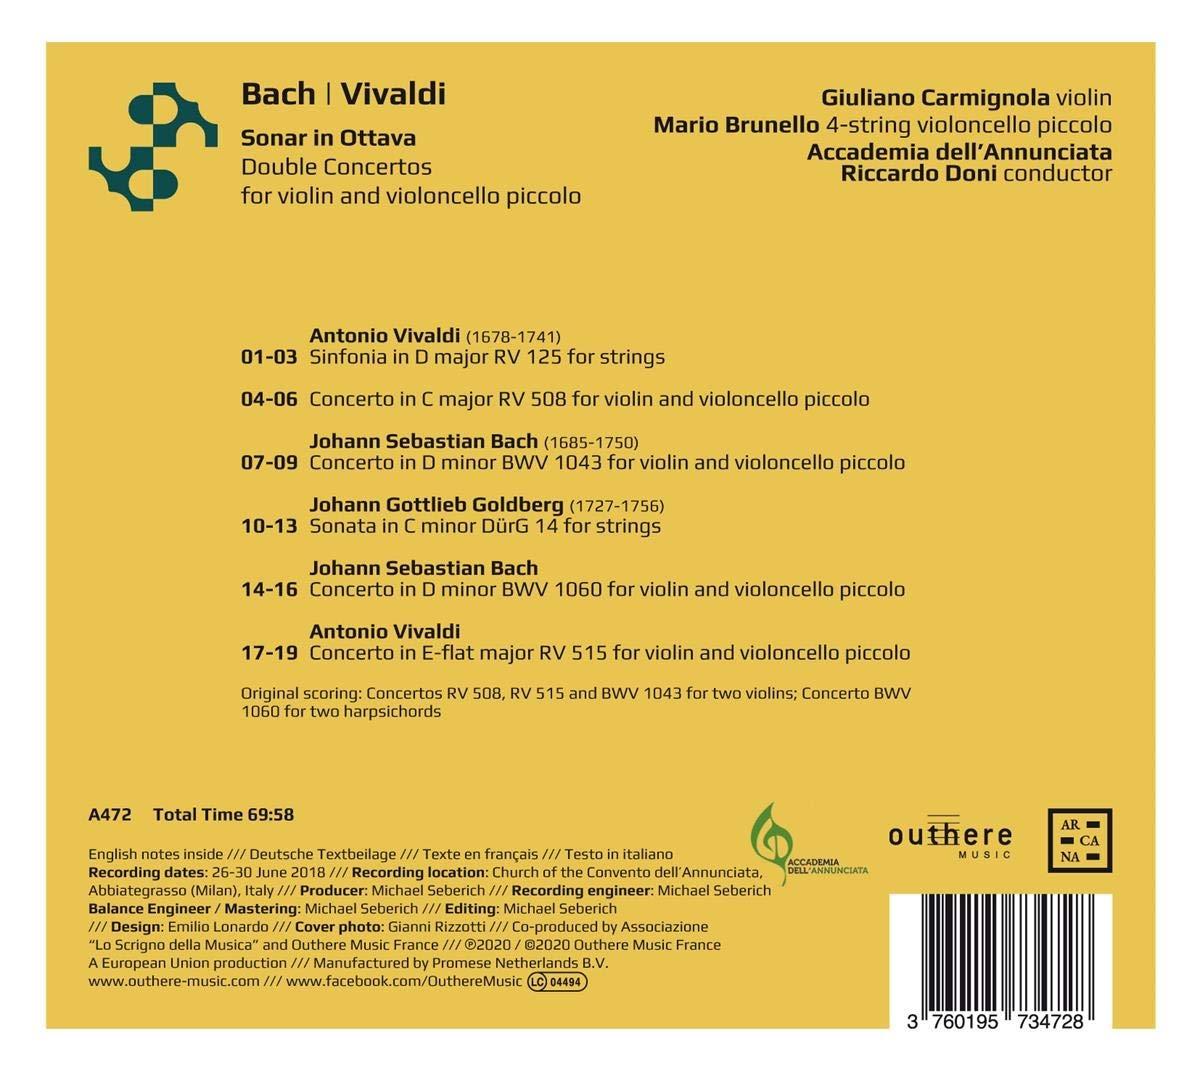 Doubles Concertos pour violon et violoncelle piccolo: Johann Sebastian Bach, Antonio Vivaldi: Amazon.es: Música